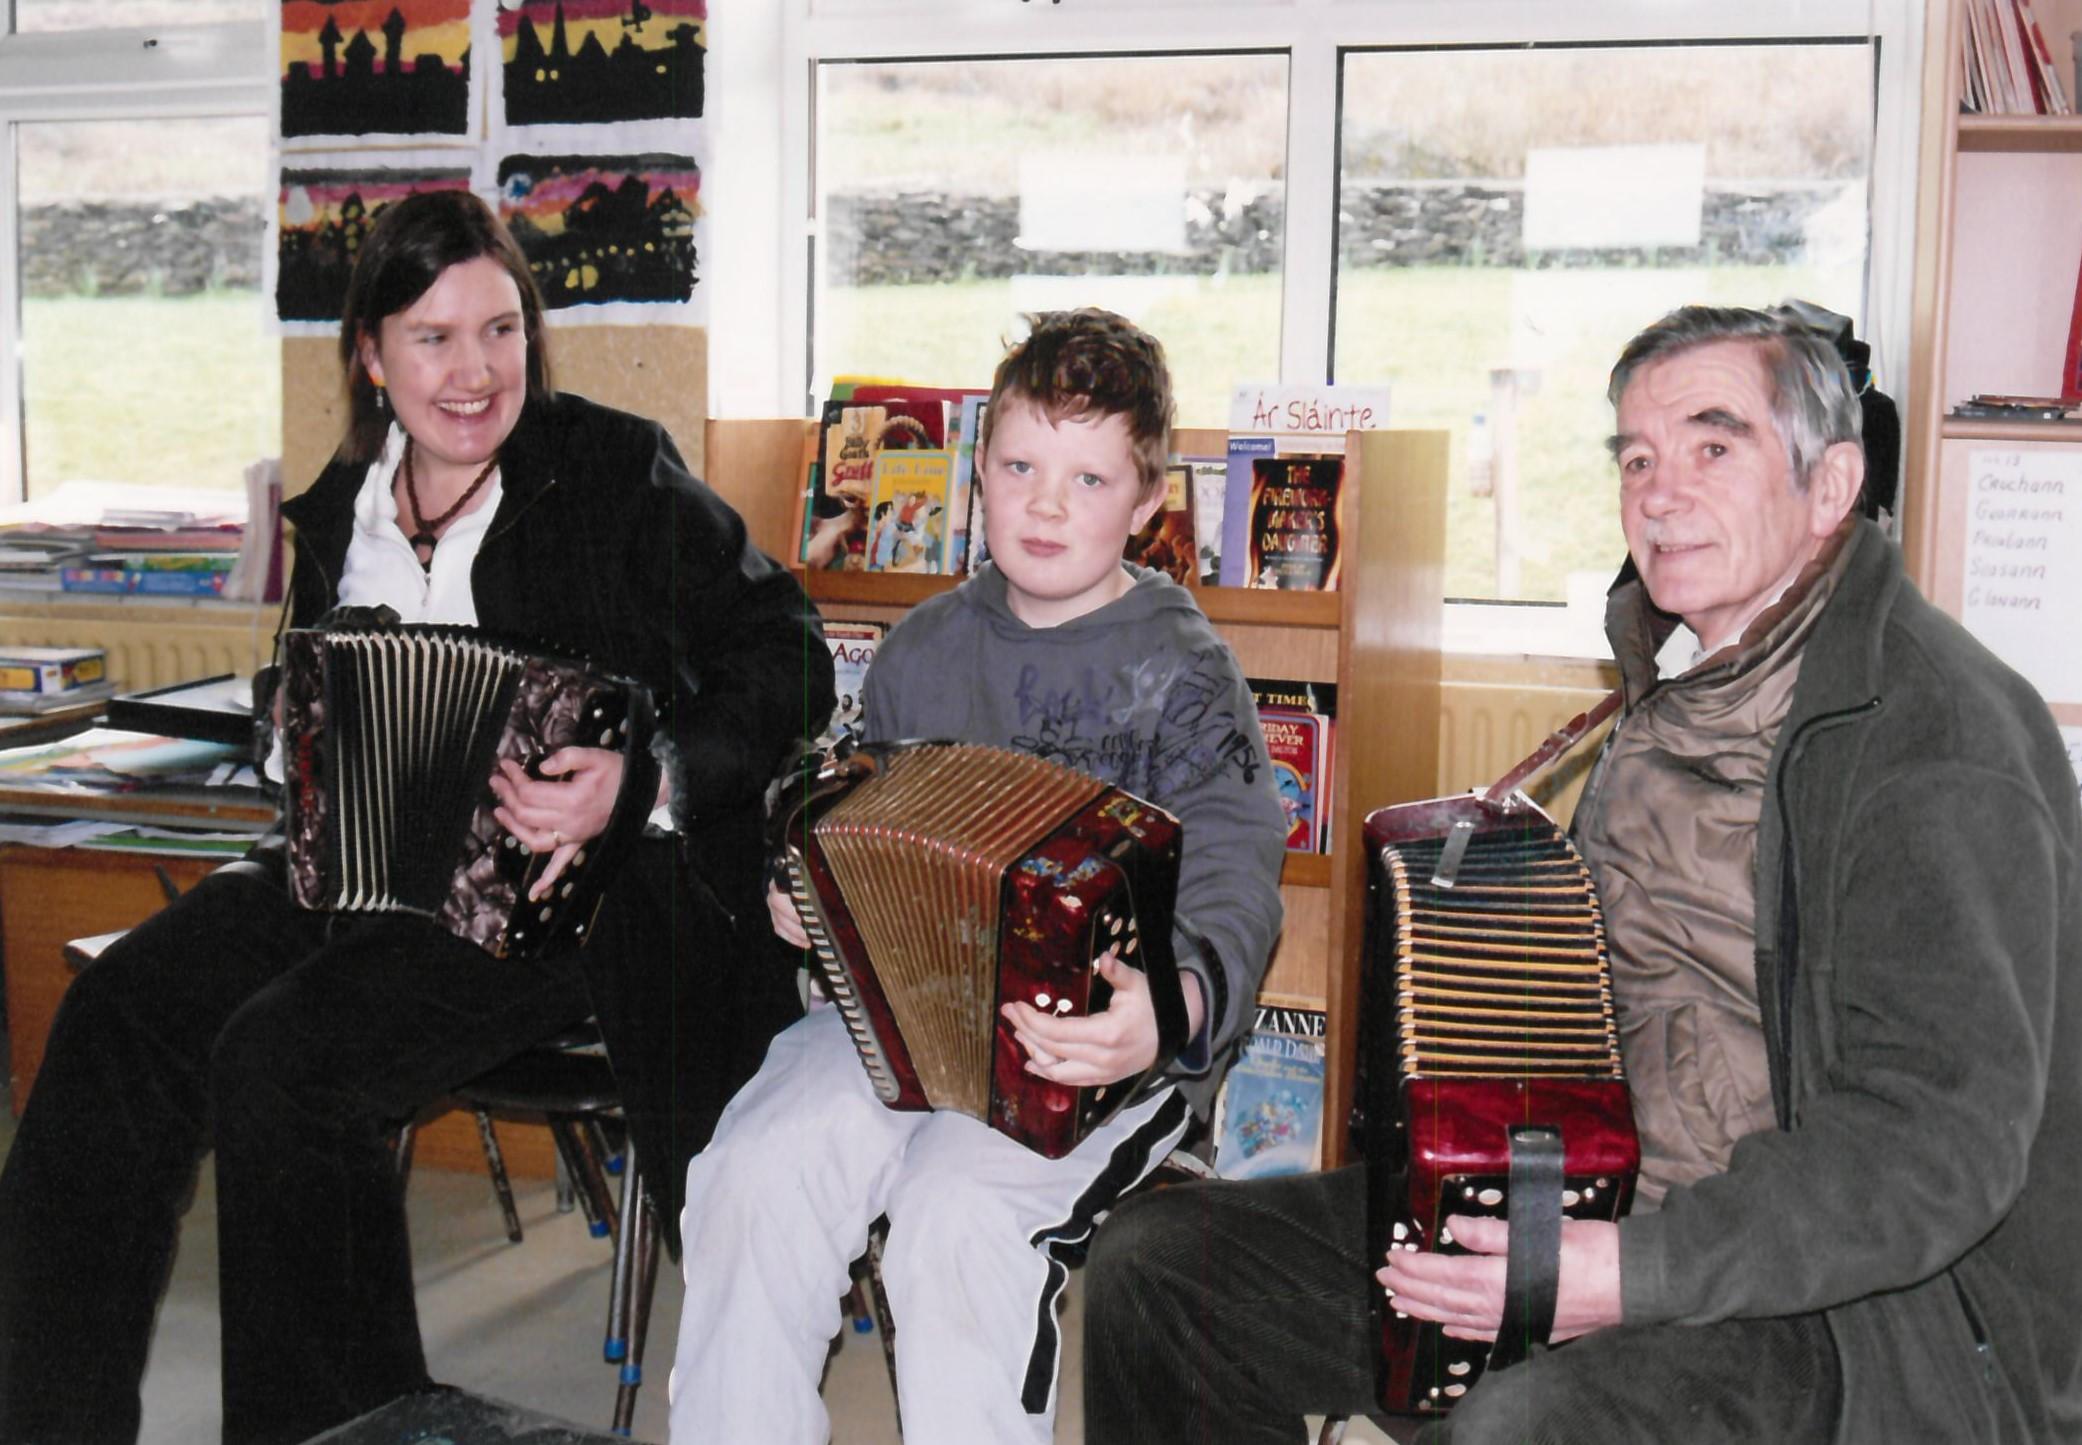 Bosca Ceoil 2006